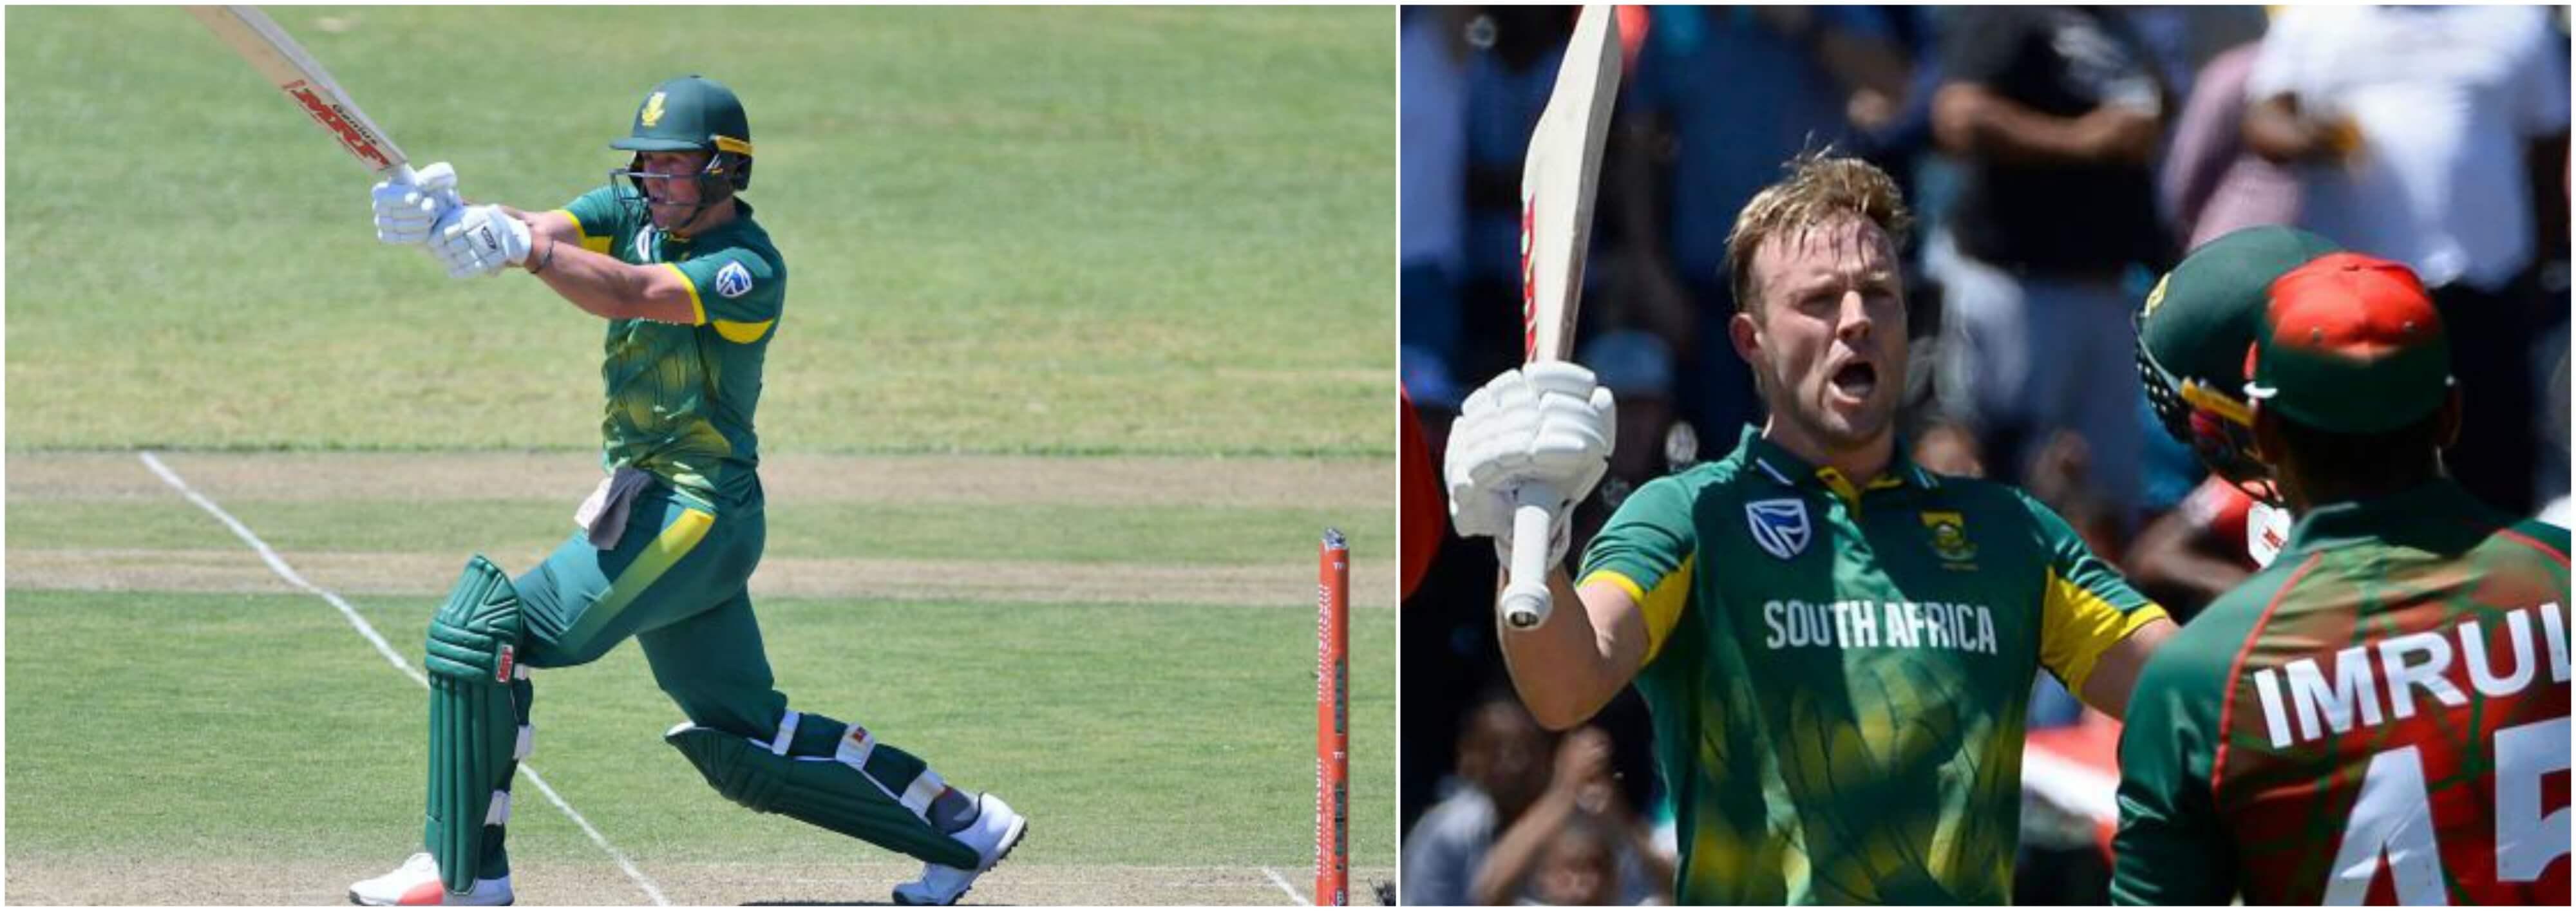 [Video]: Highlights of AB de Villiers' career best 176